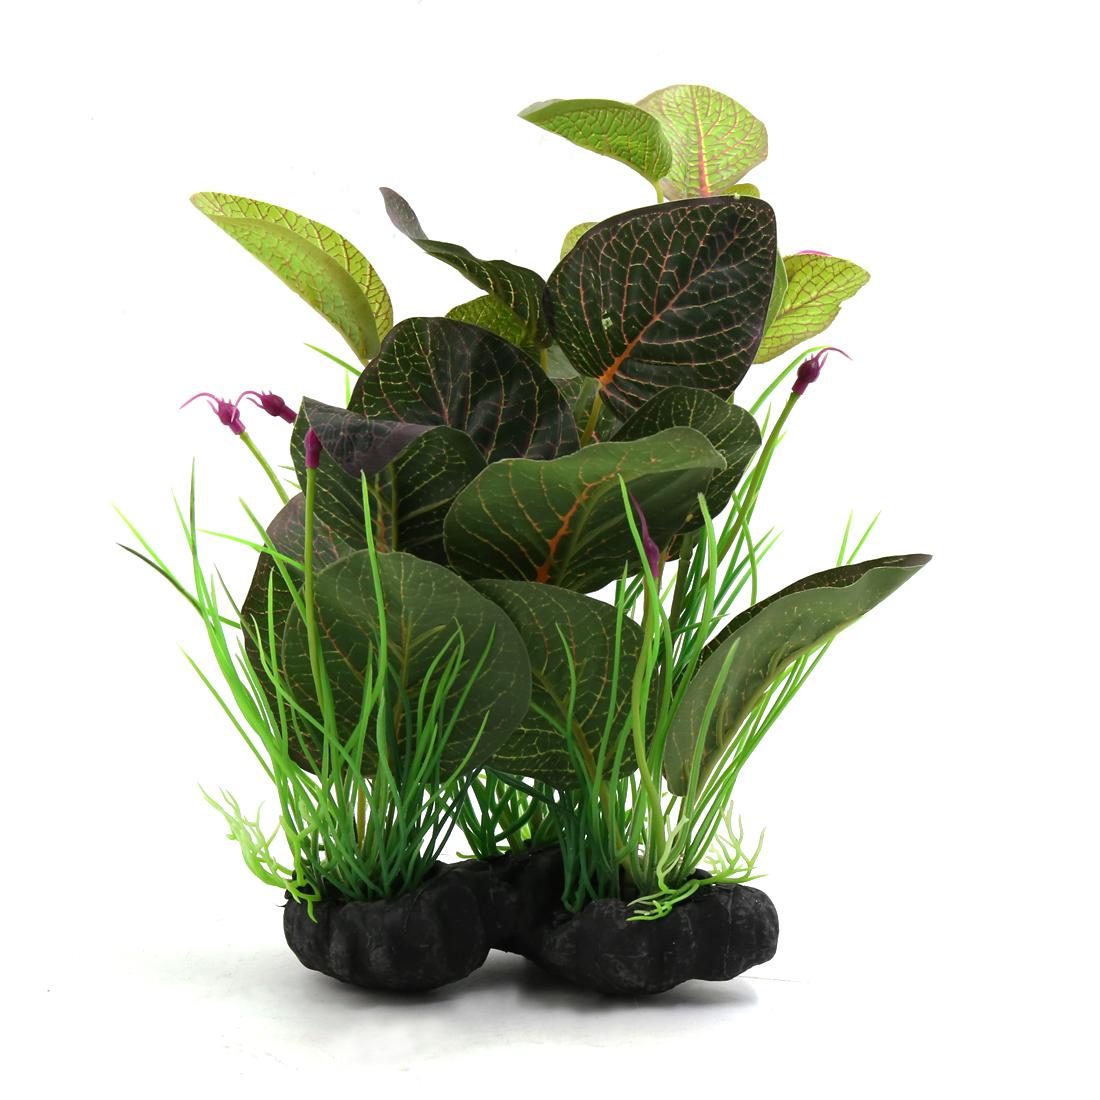 Green Plastic Terrarium Leaves Plant Ornament for Reptiles and Amphibians